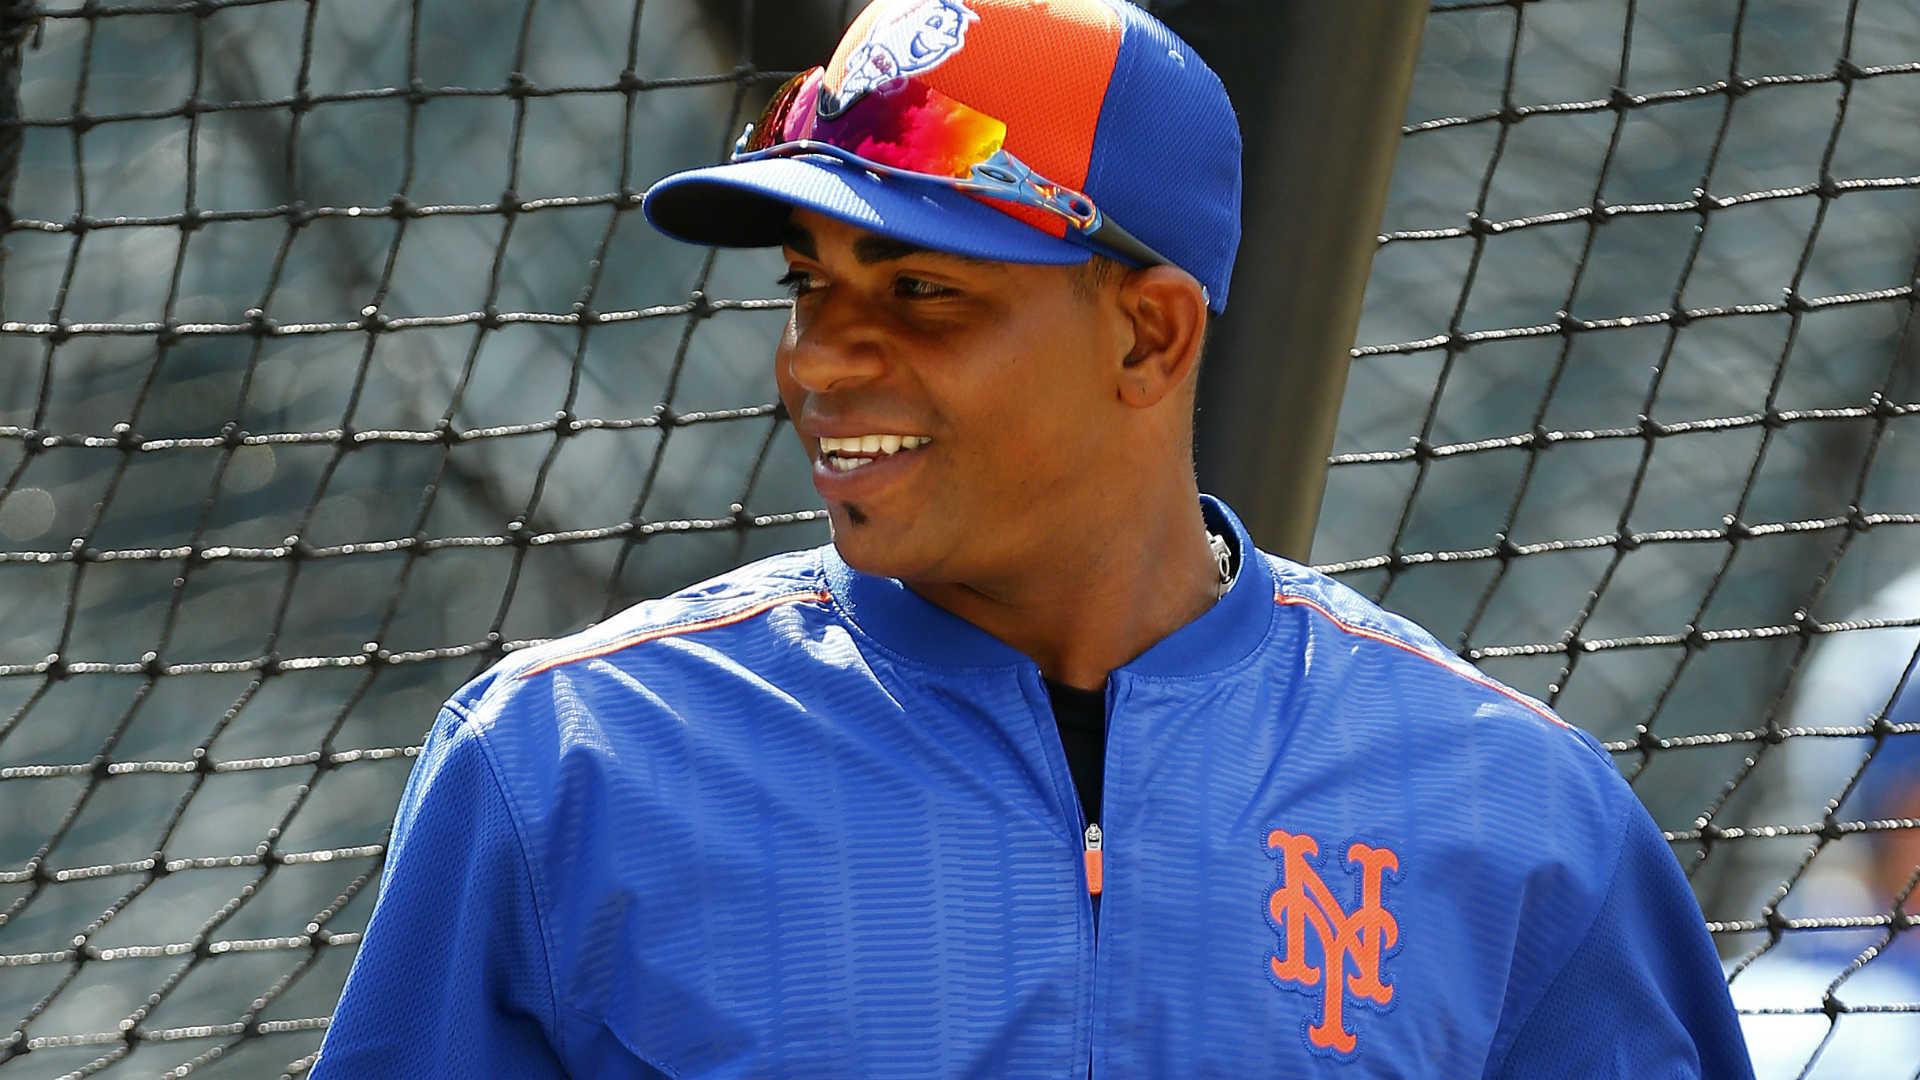 Mets' Yoenis Cespedes eyes a second career in golf | MLB ...